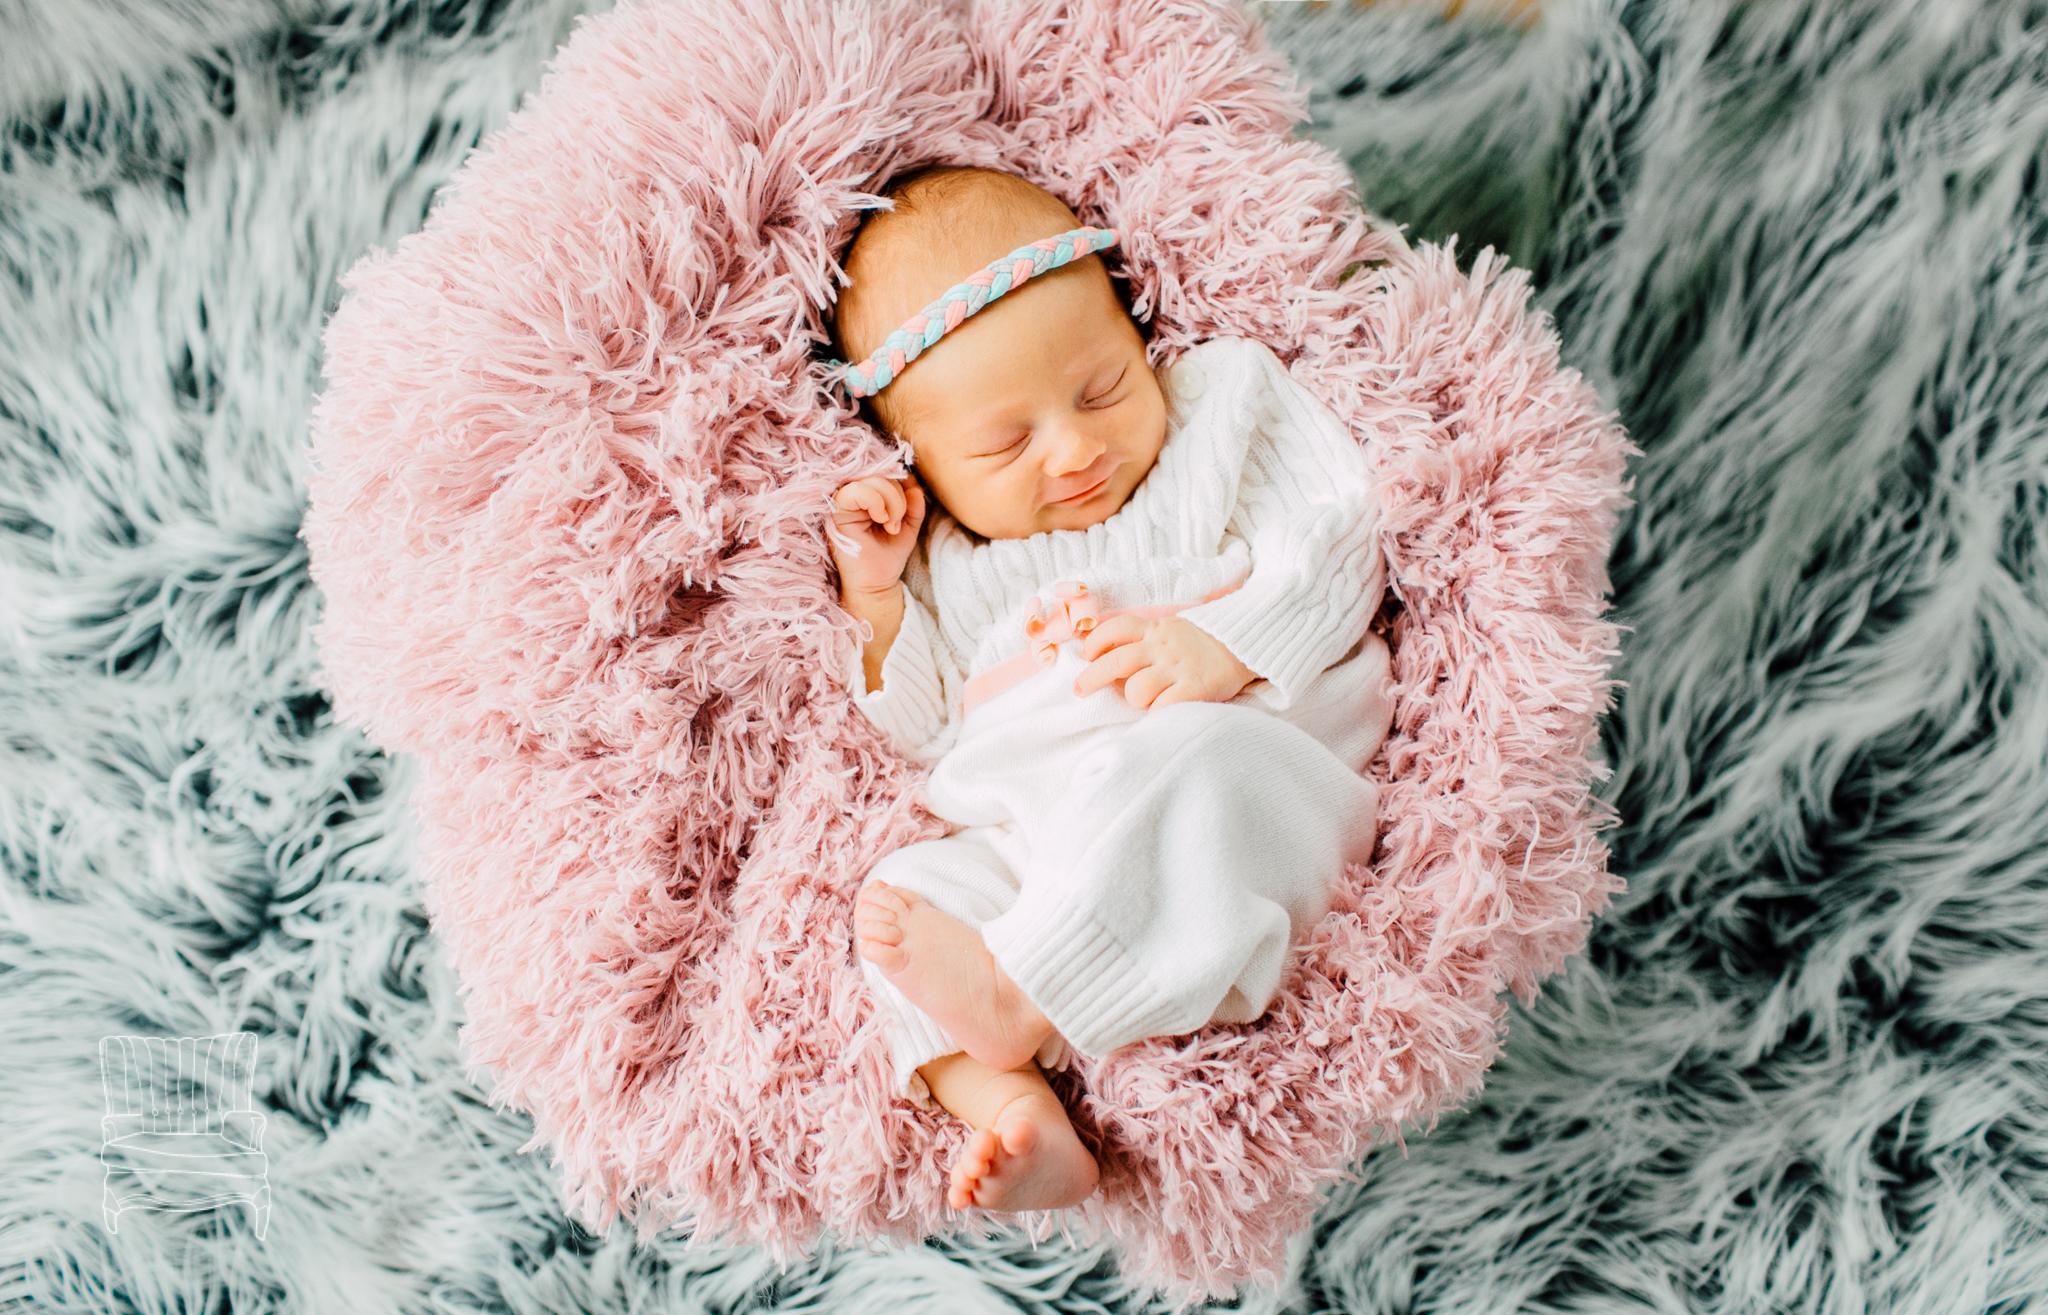 belligham-newborn-photographer-katheyrn-moran-hadley -3.jpg